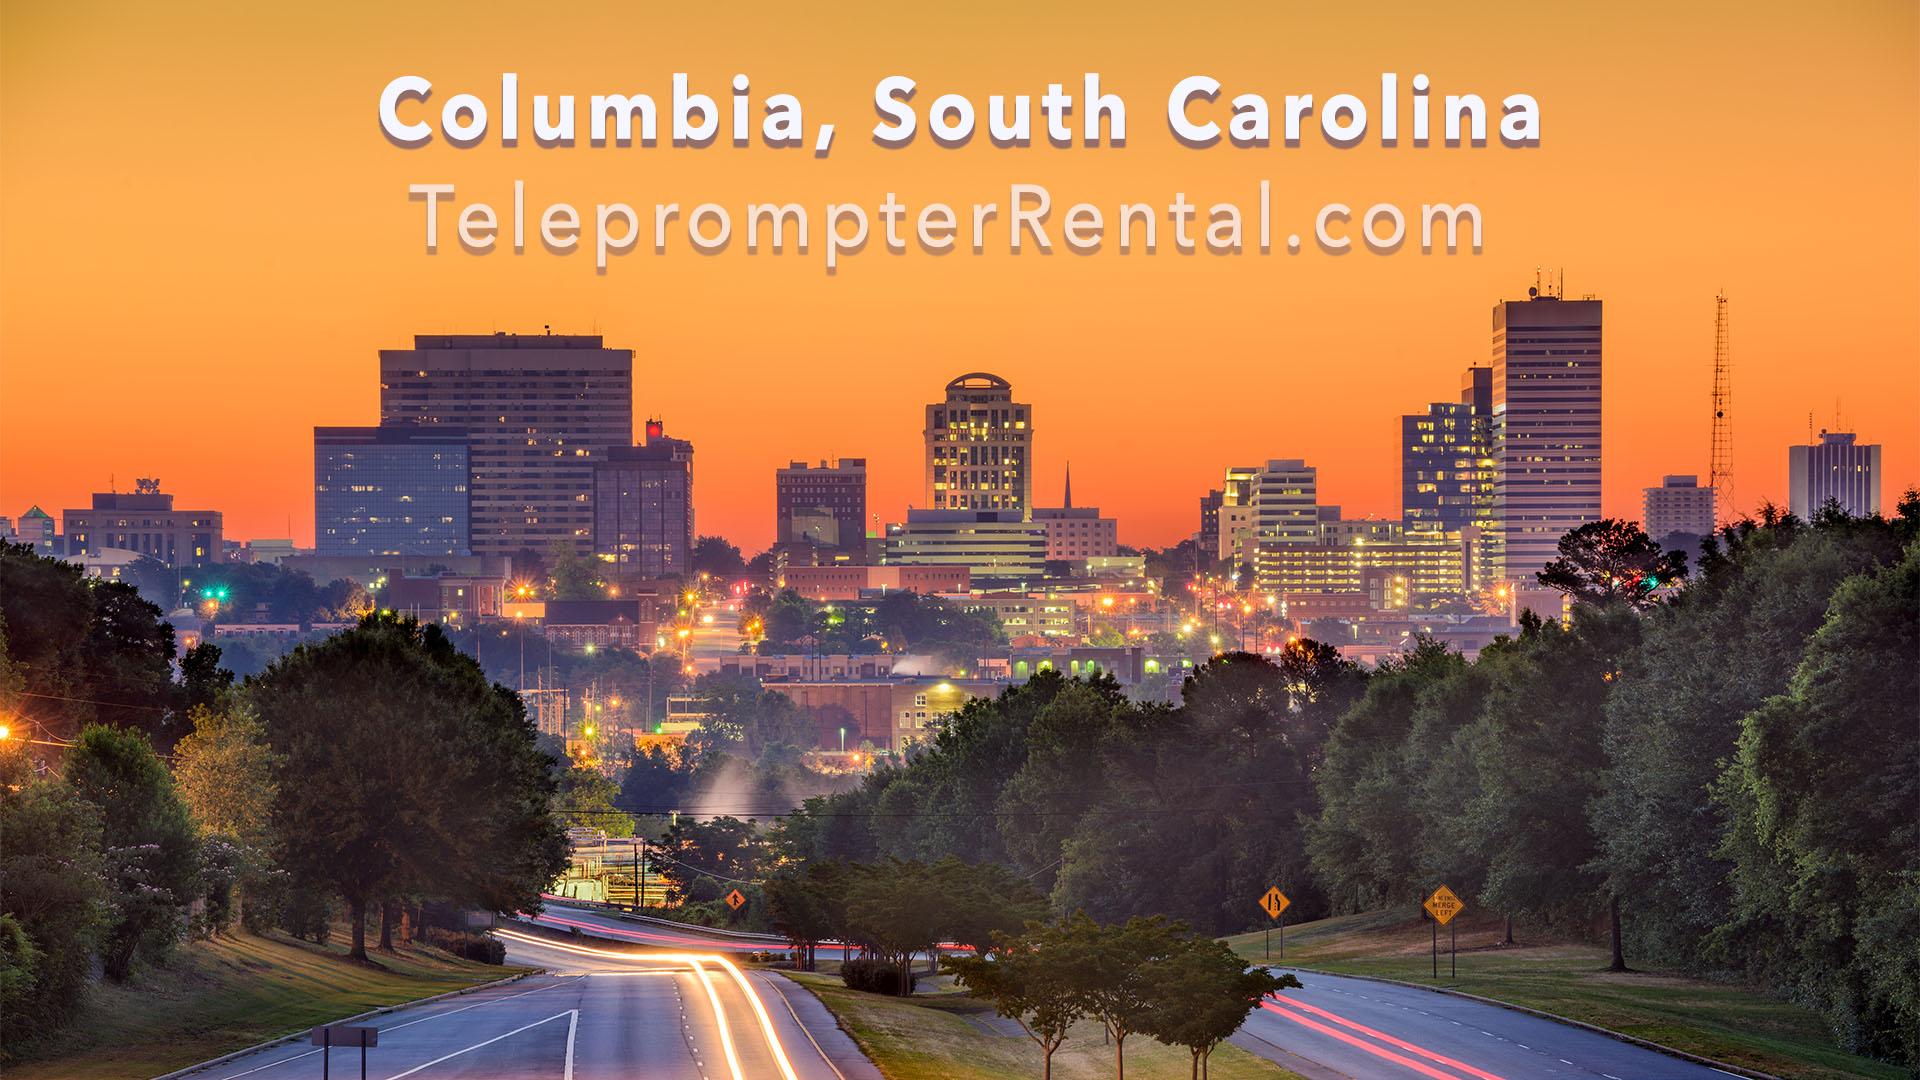 Columbia South Carolina - TeleprompterRental.com